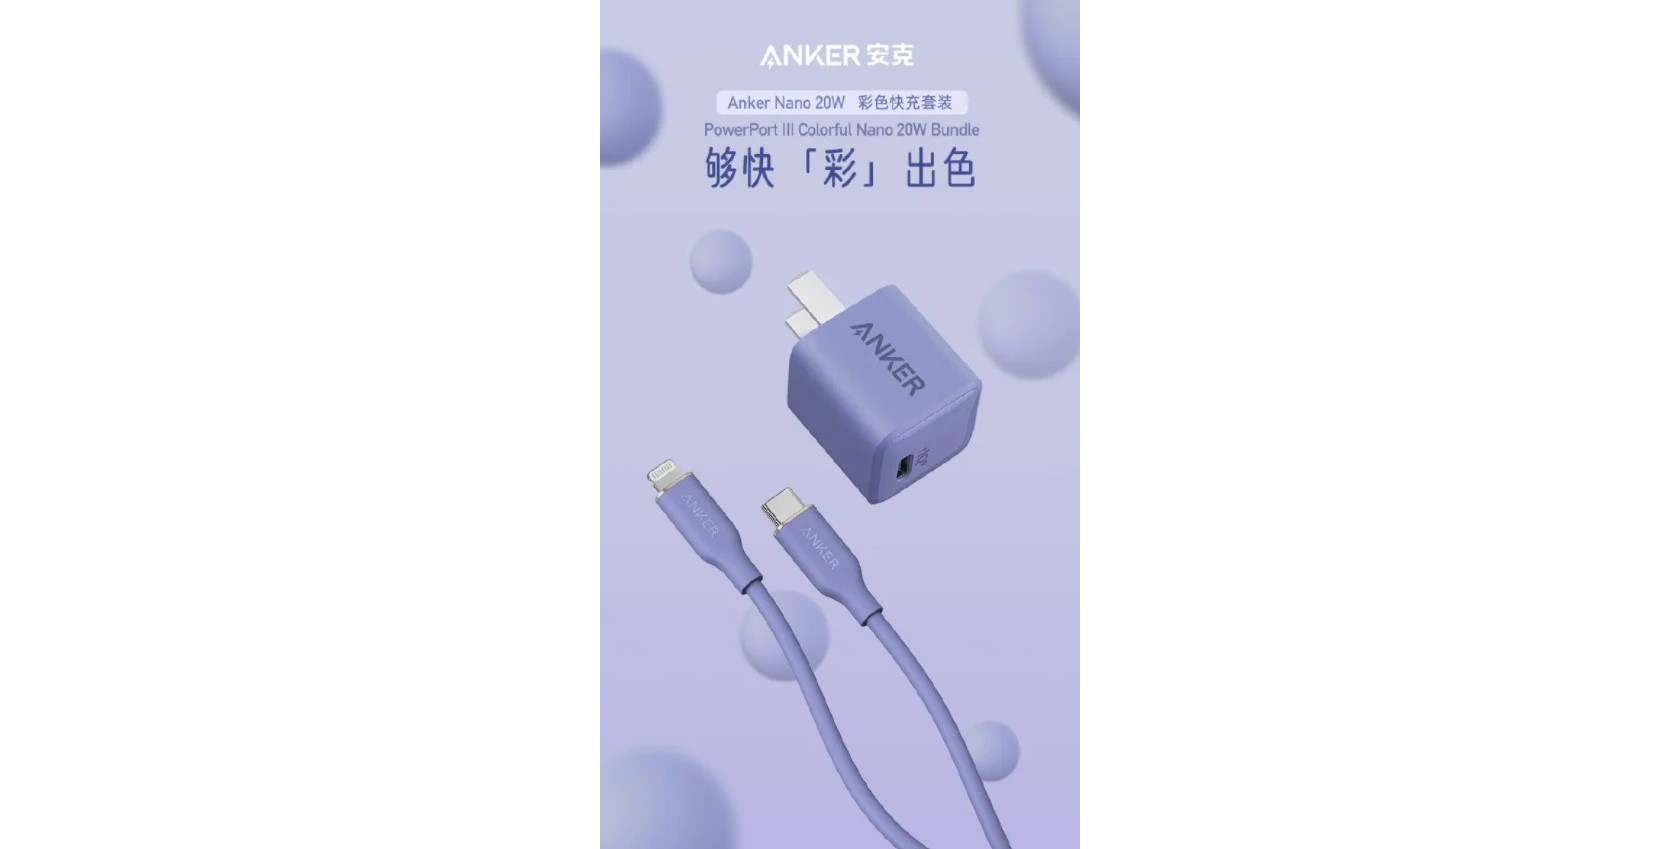 Anker ออกที่ชาร์จใหม่ต้อนรับ iPhone 12 สีม่วง